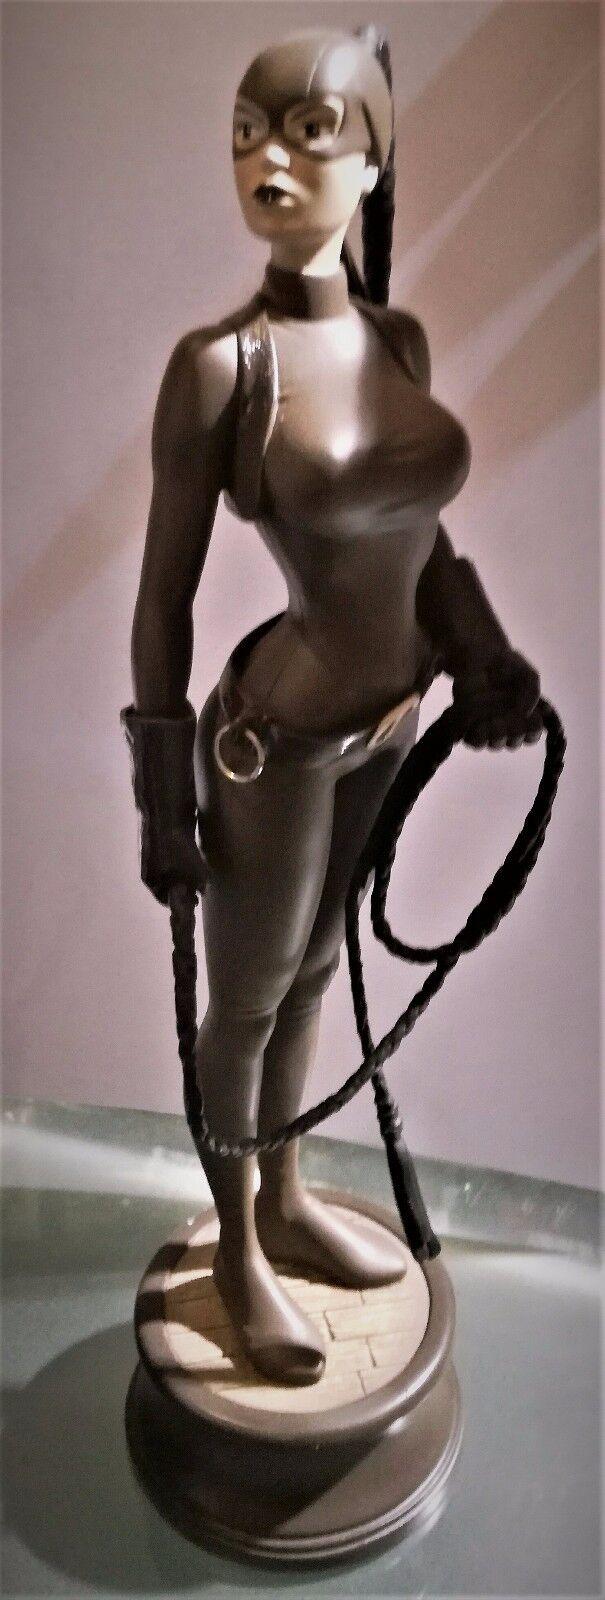 CIXI DE TROY Statue CIXI 2 Version Version Version Sepia 150 ex Pin Up Attakus PROMO 5376b4